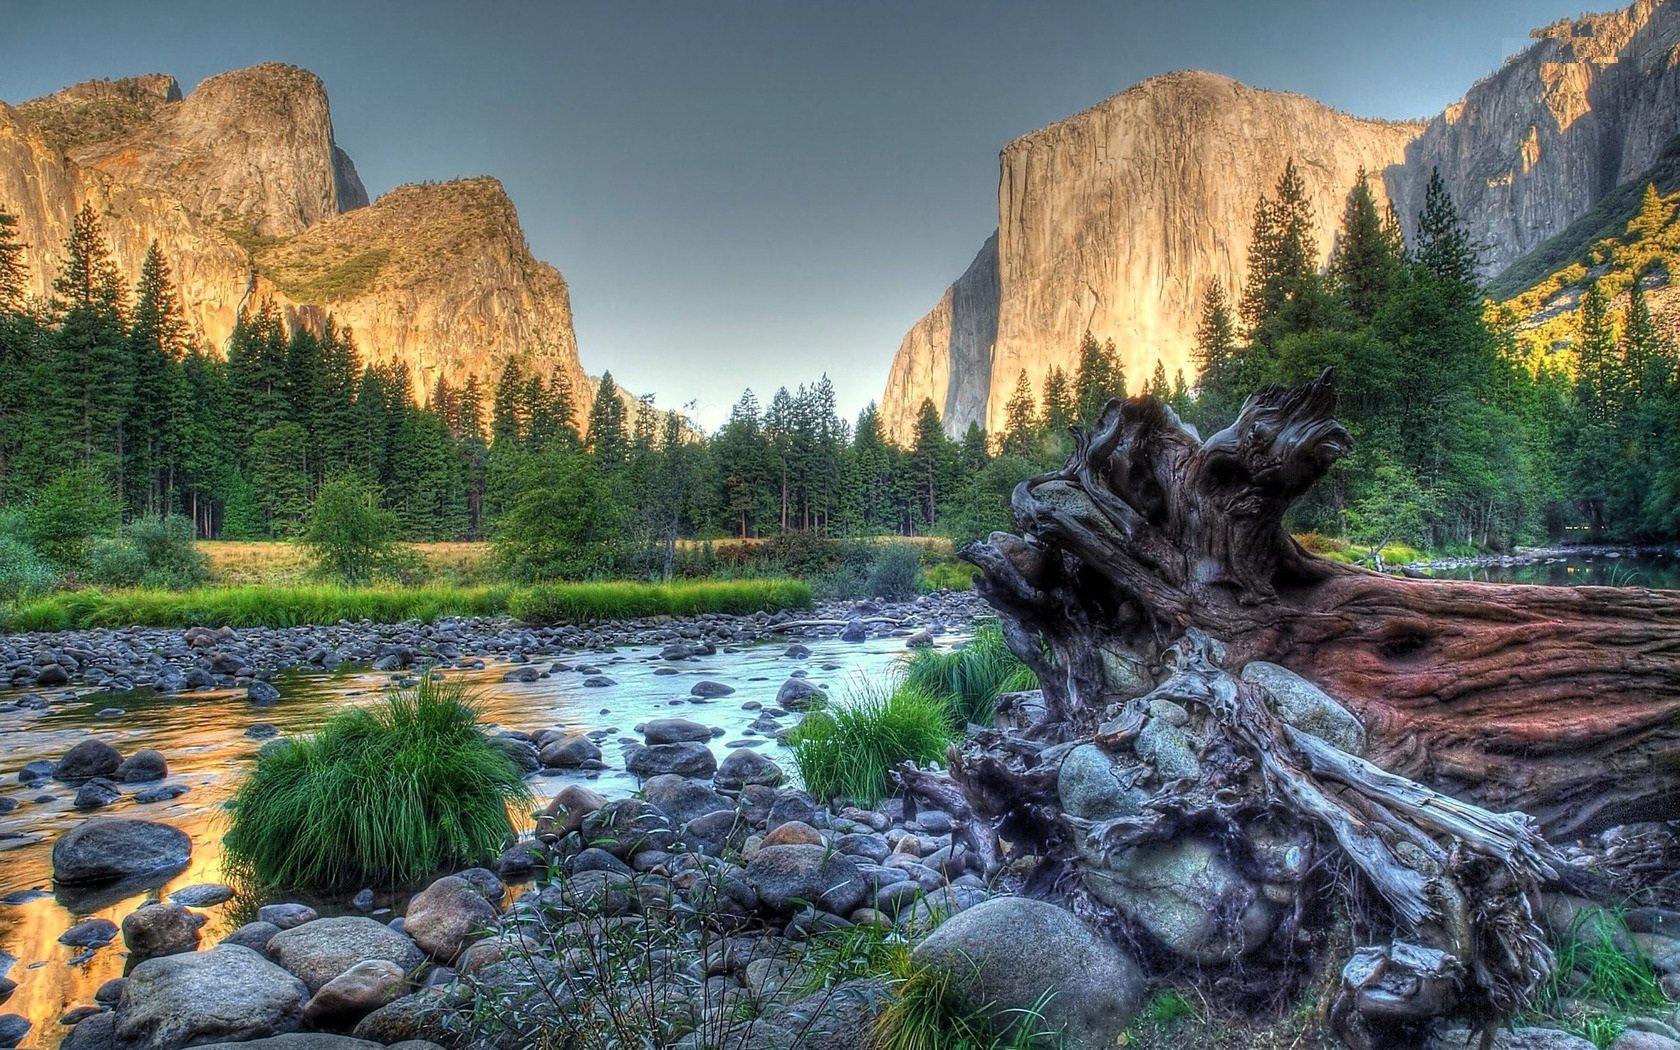 Yosemite National Park HD Wallpapers Toptenpackcom 1680x1050